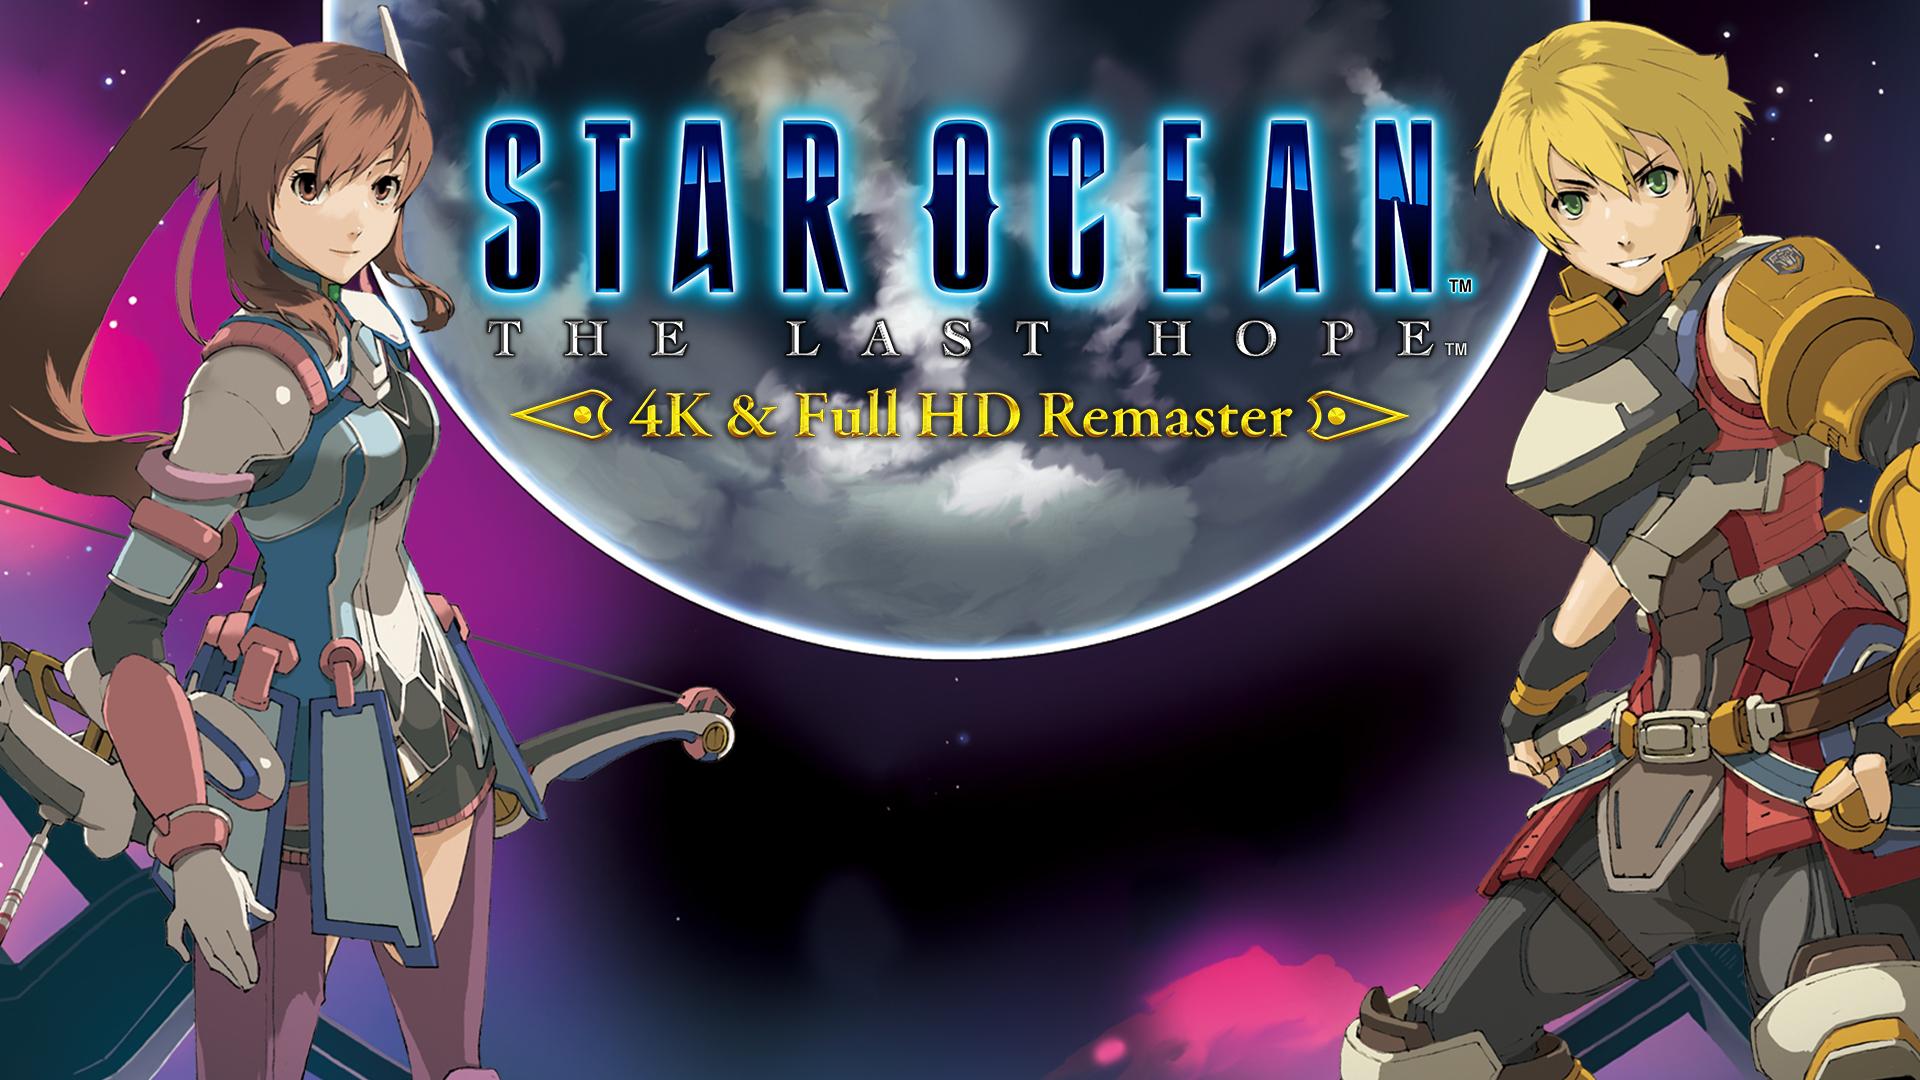 Star Ocean - The Last Hope (Standard Edition) (Star Ocean Pc)